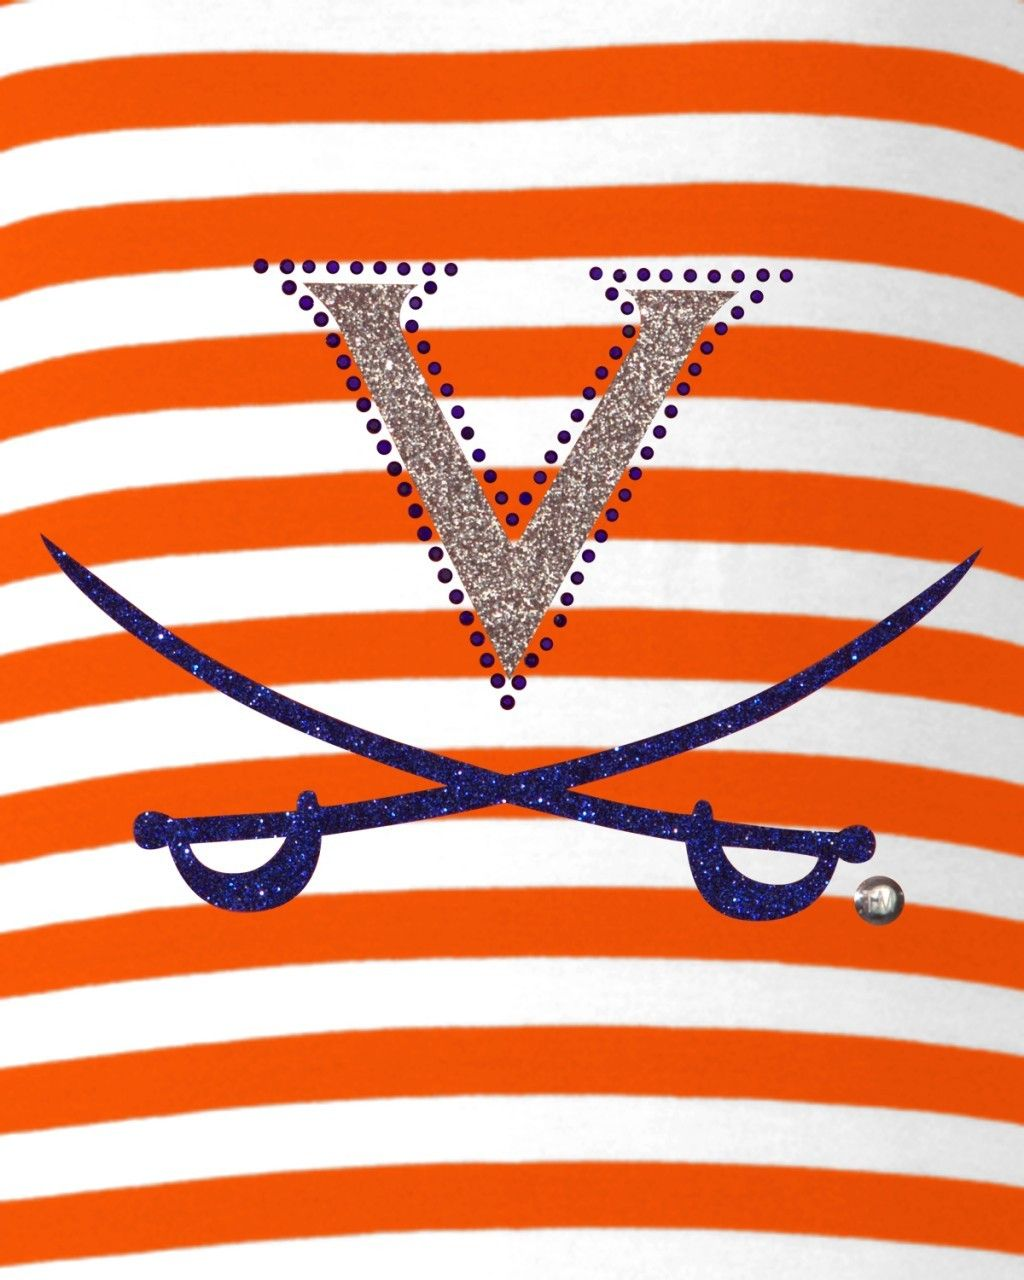 Virginia Cavaliers Team Fashion Apparel meesh & mia